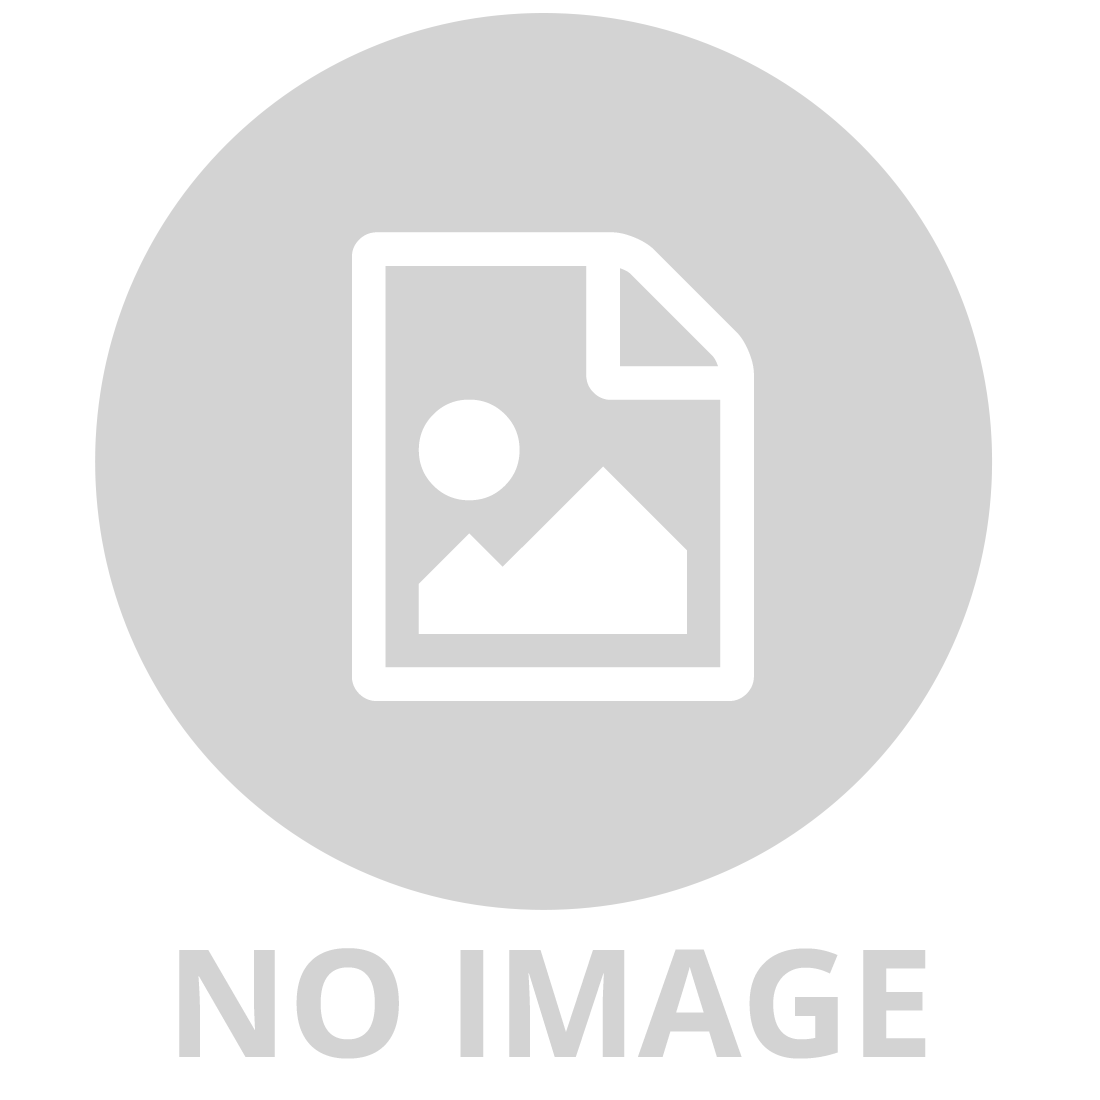 OTRIO BRAIN WORKSHOP GAME